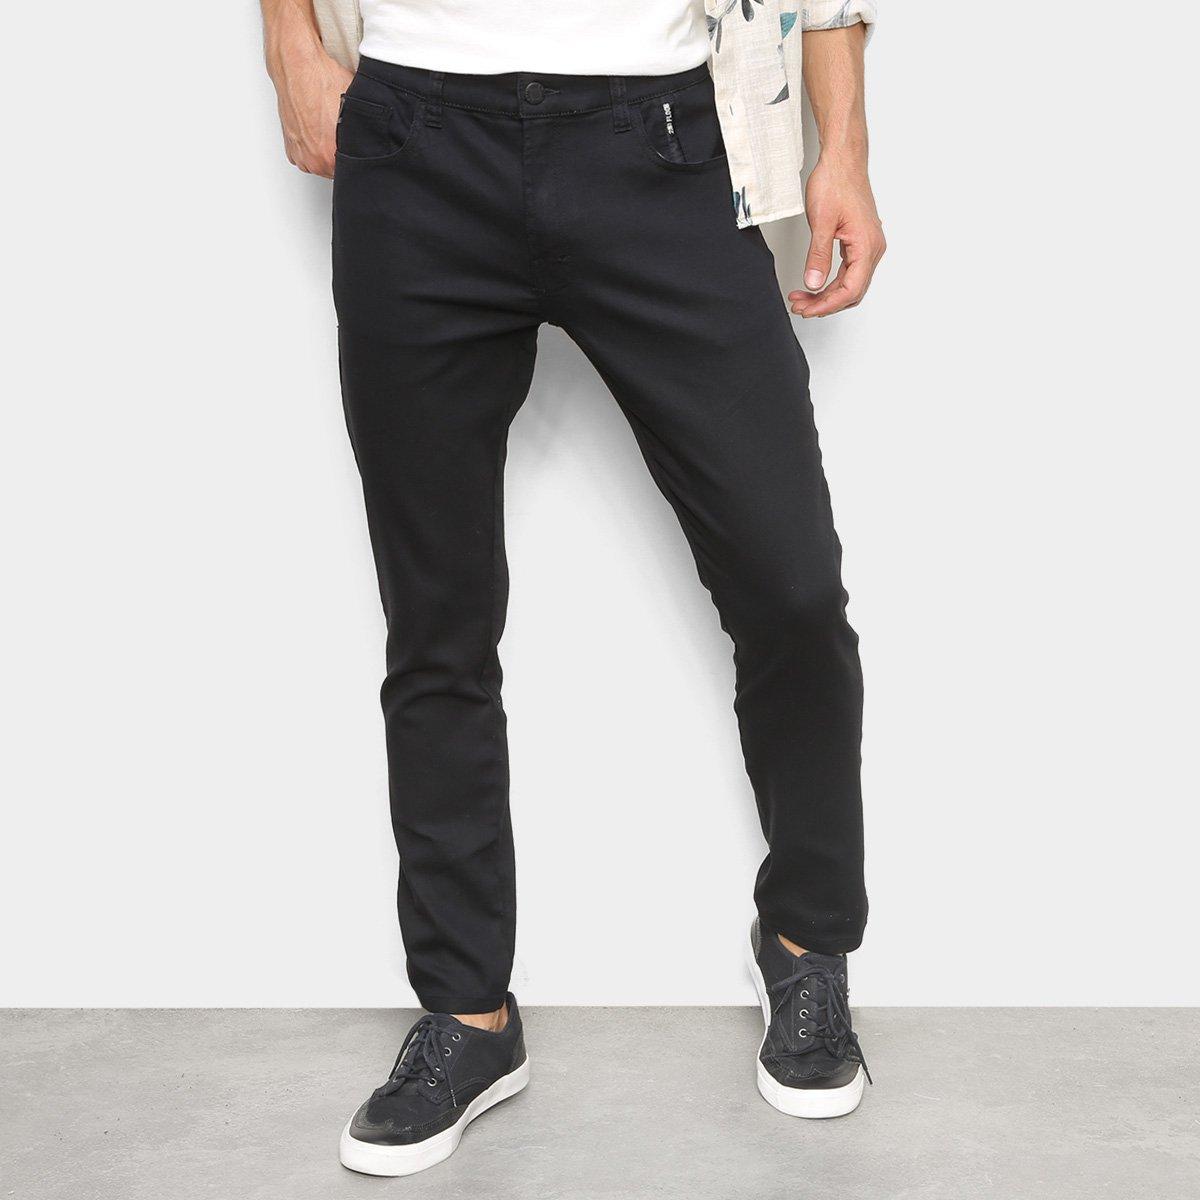 Calça Jeans Skinny Ellus 2Nd Floor Masculina